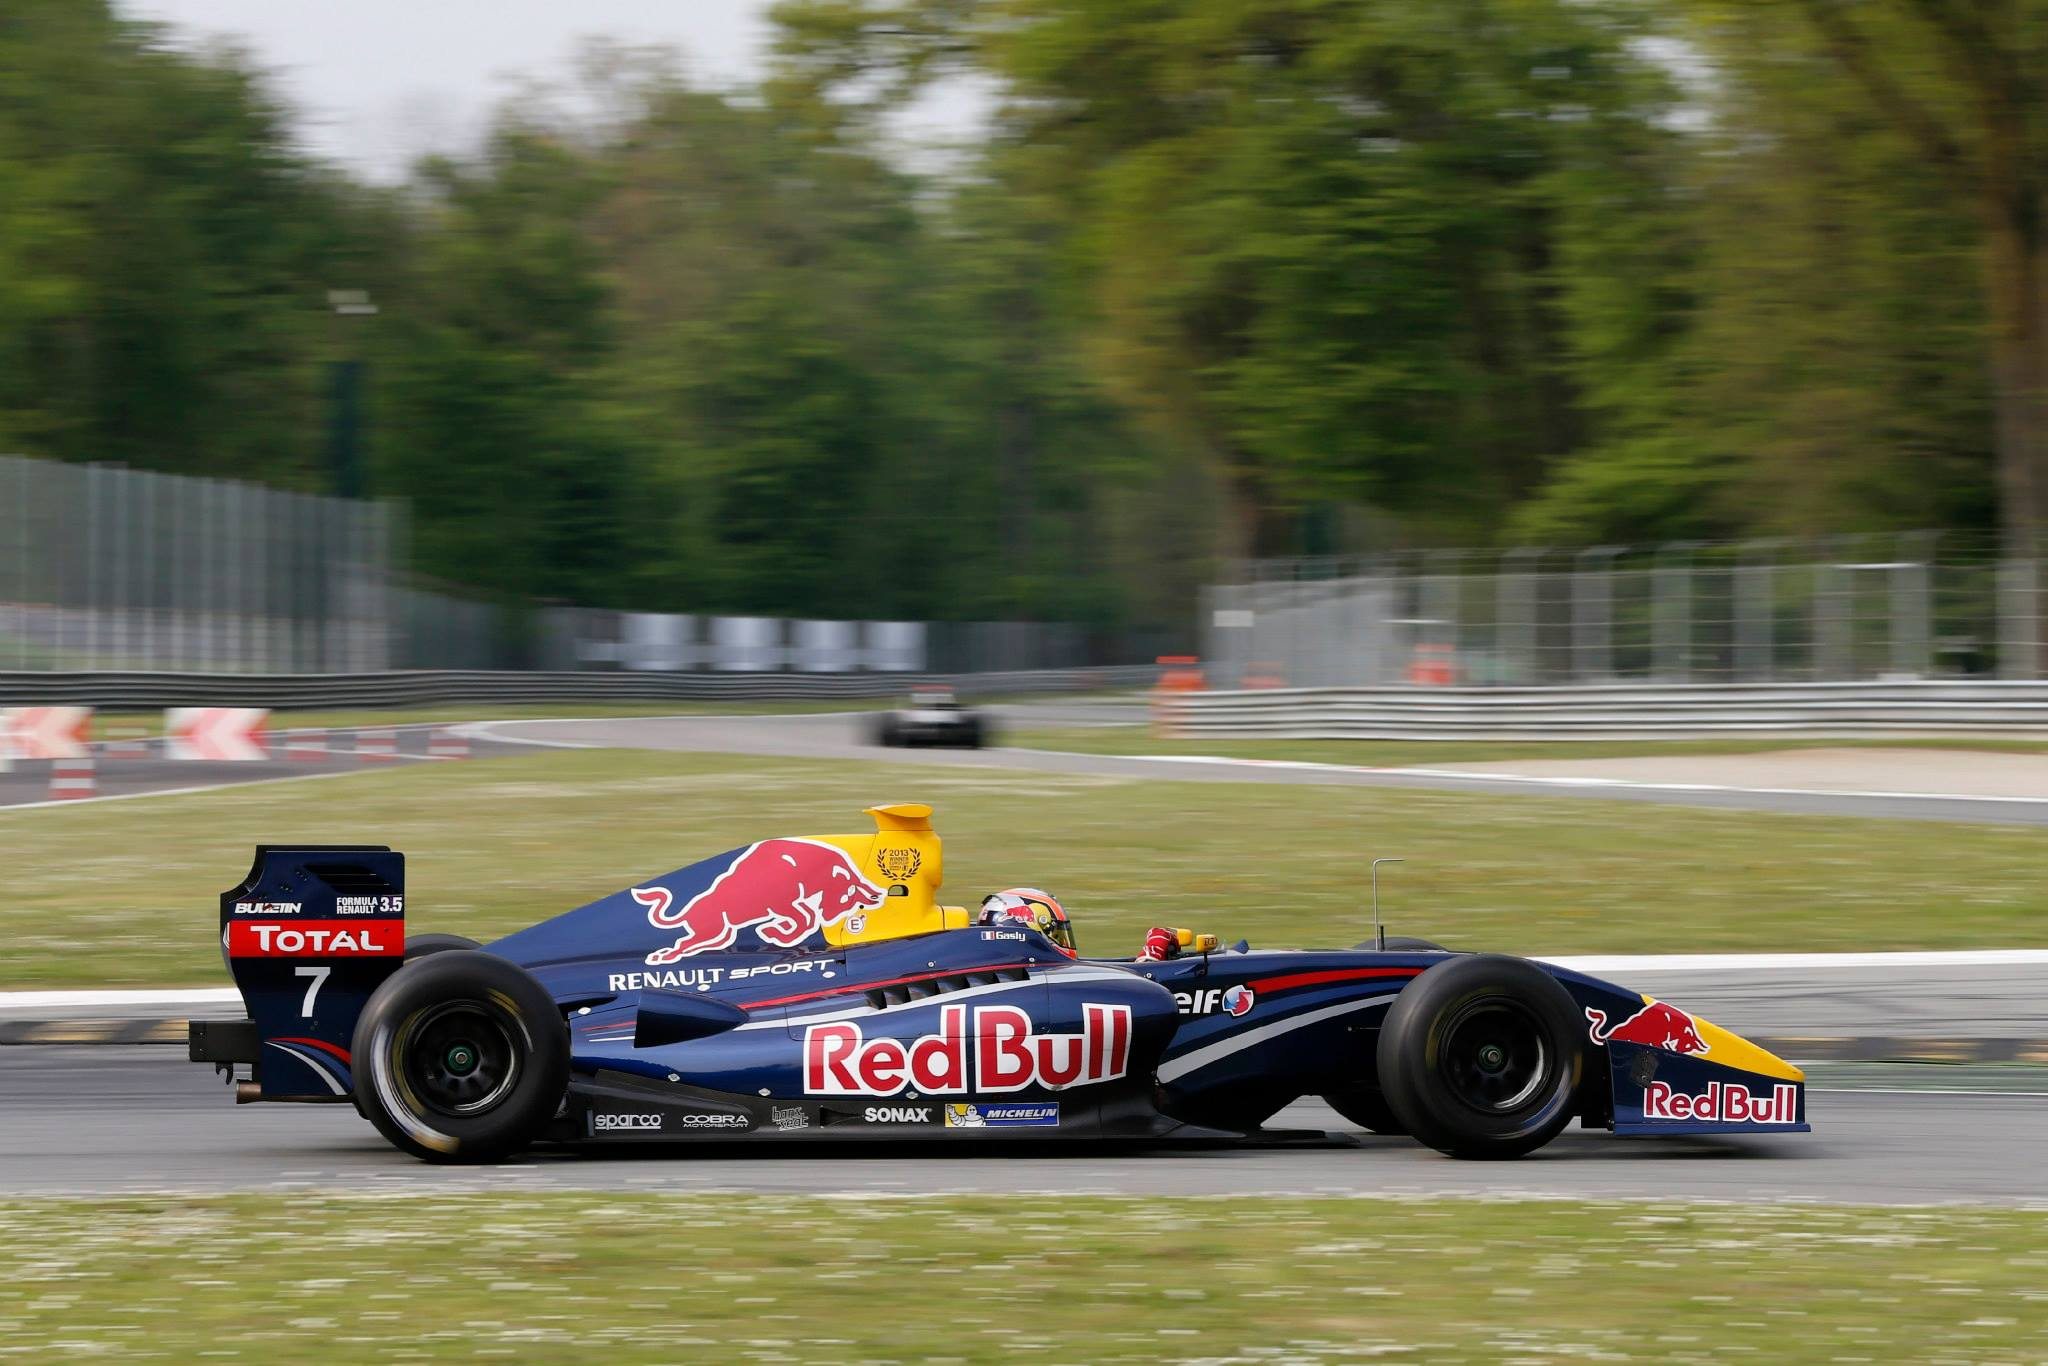 2014 Formula Renault 3.5 Series - Monza - Pierre Gasly